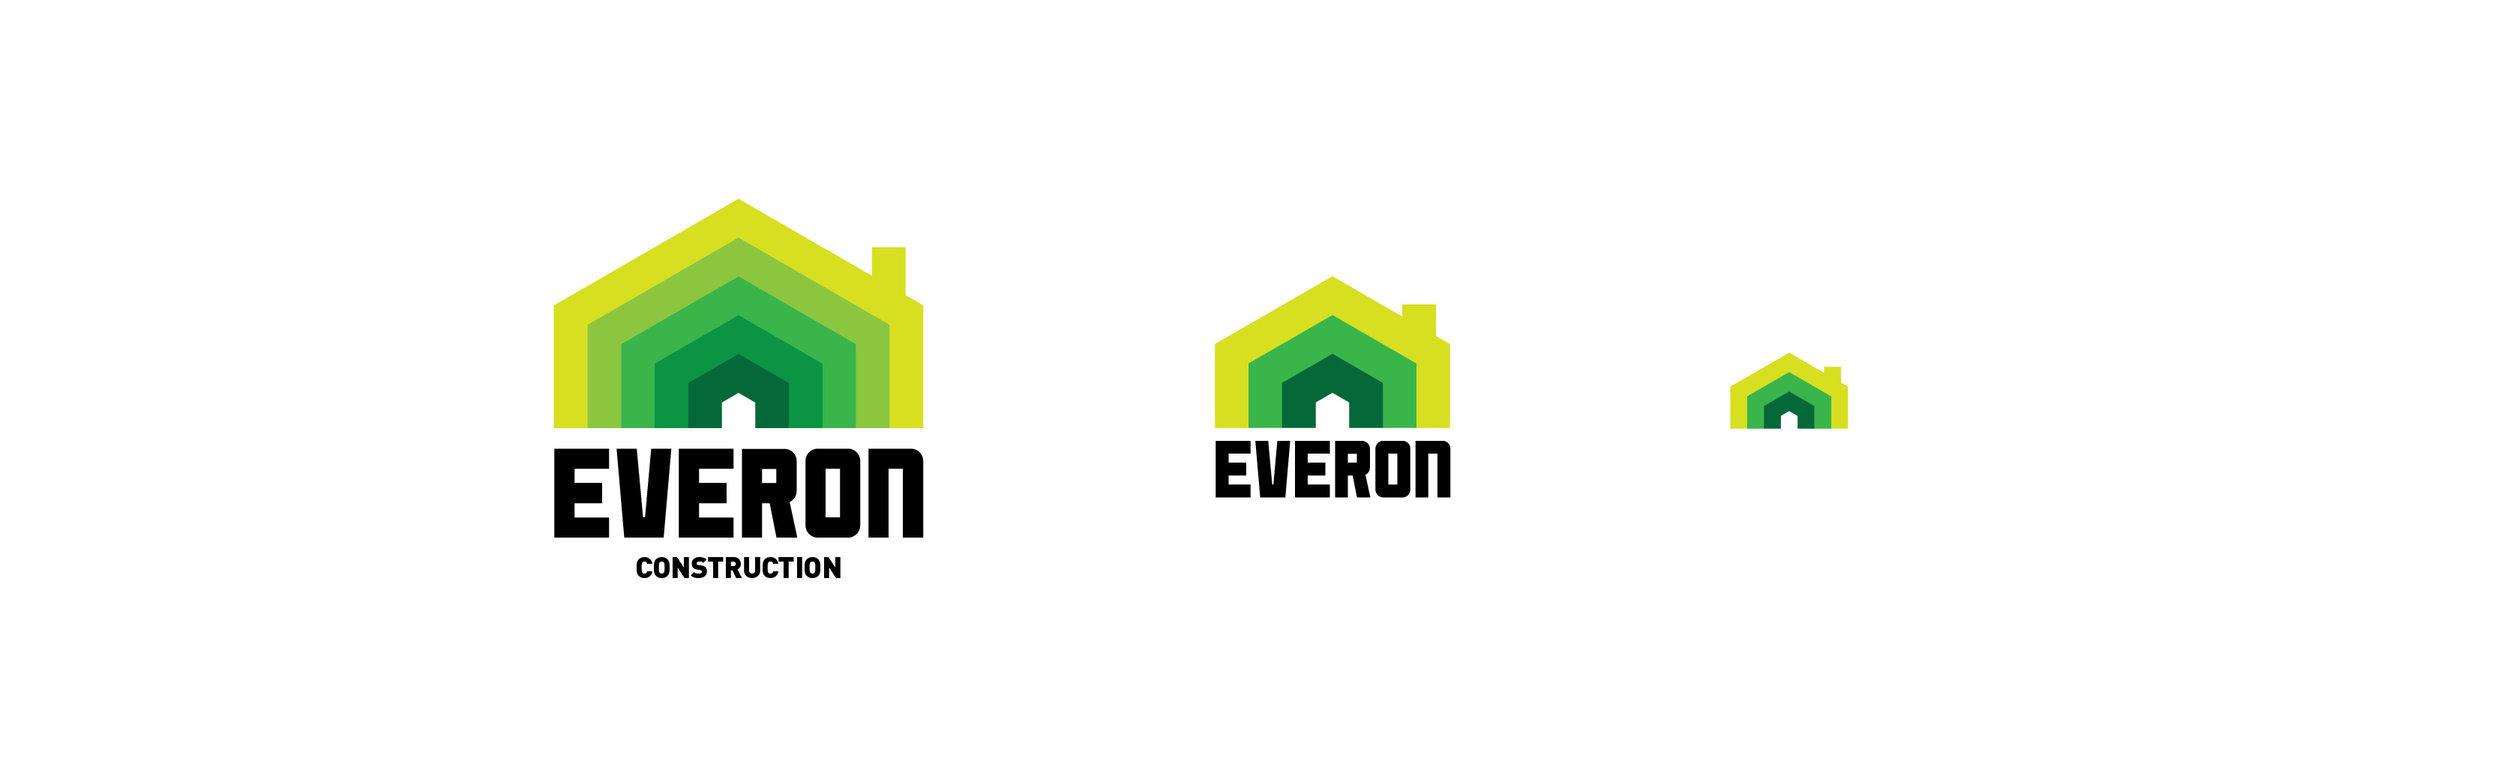 everon_design-04.jpg